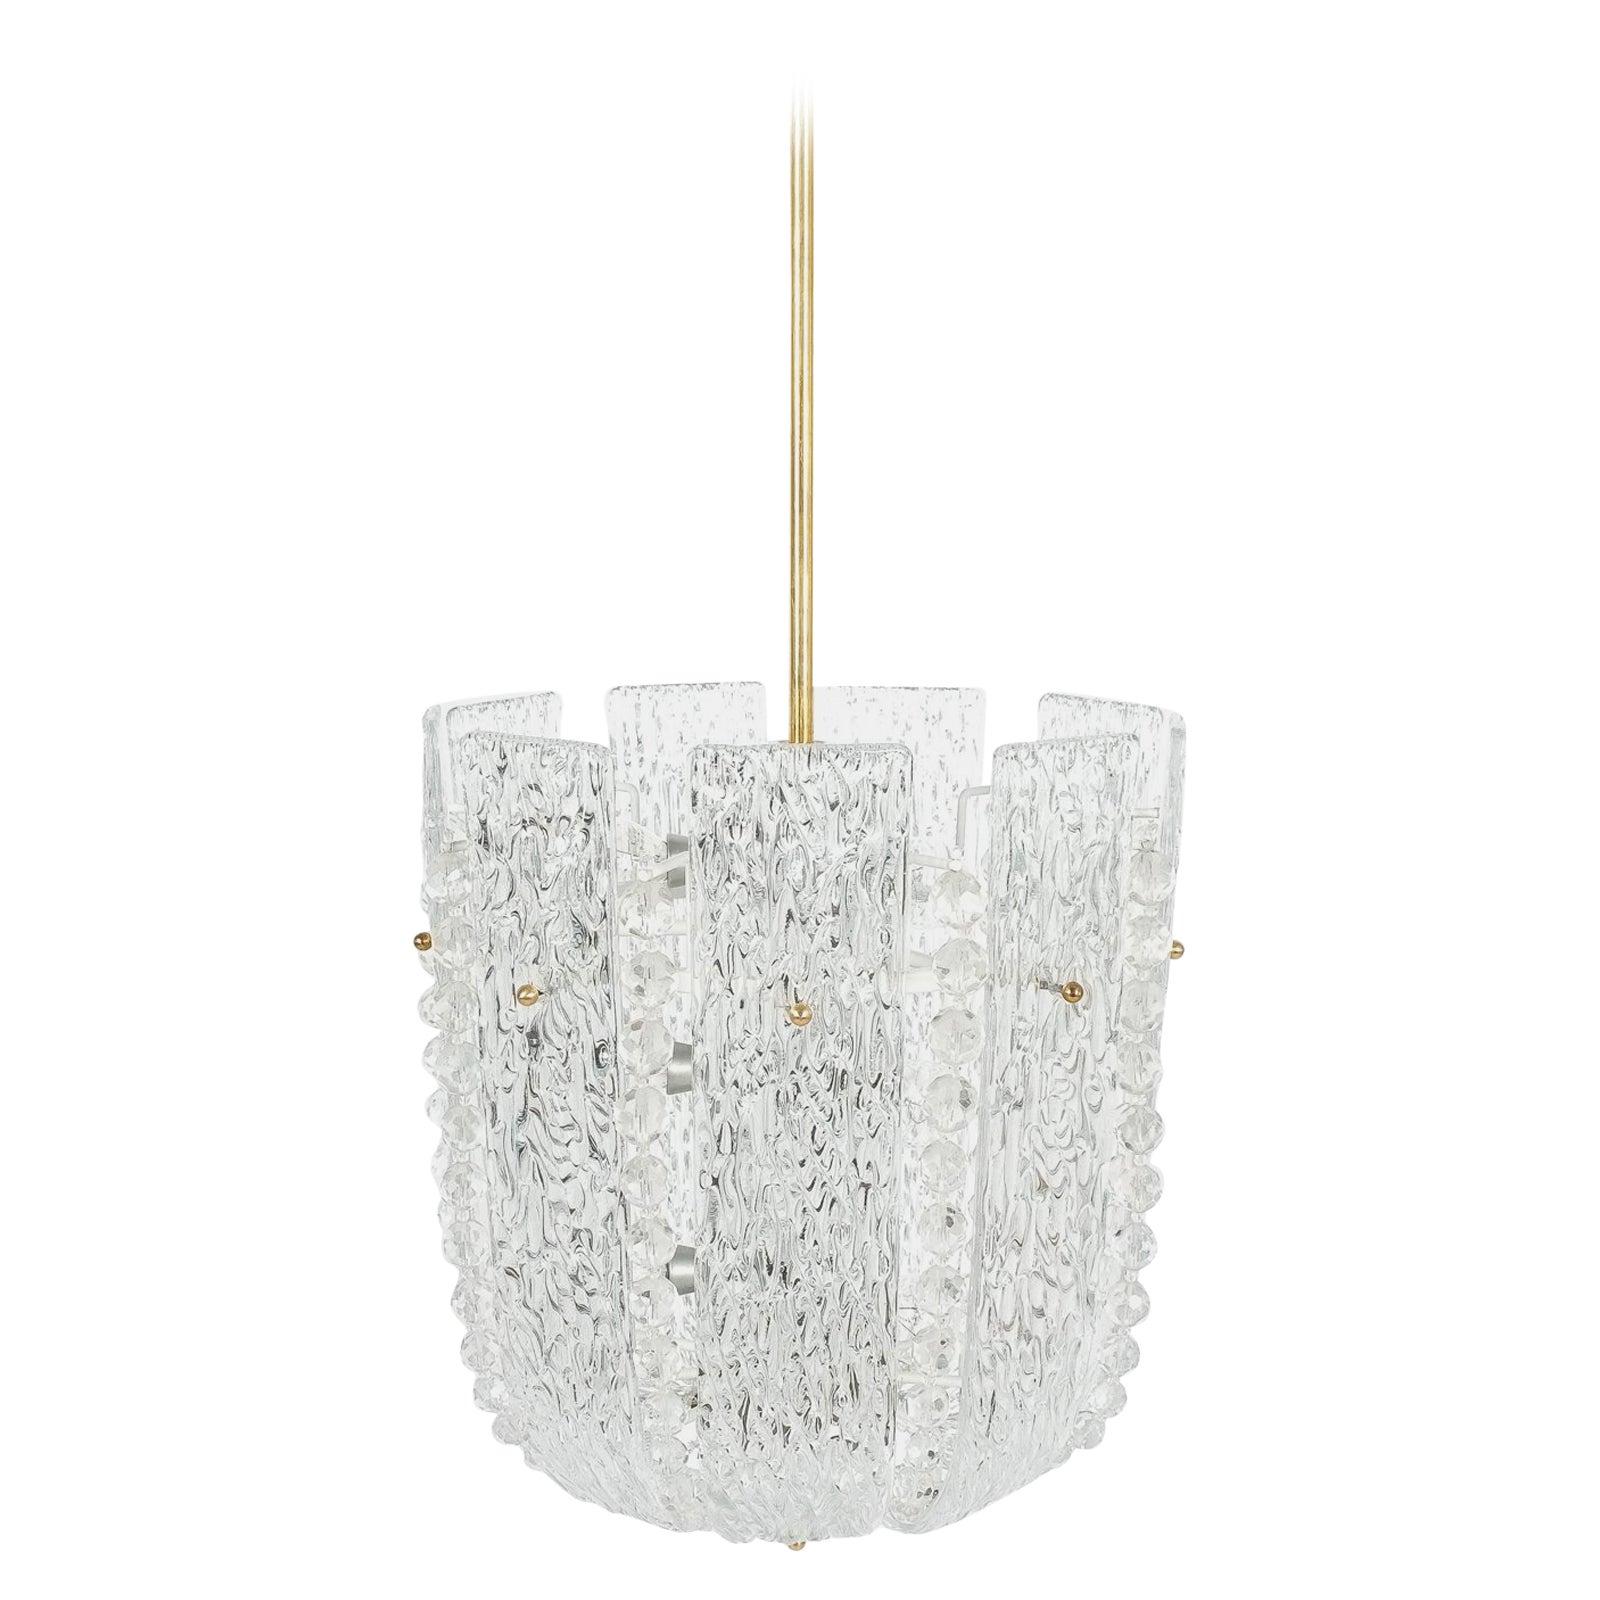 J.T Kalmar Glass and Brass Basket Chandelier Lamp, Austria 1950